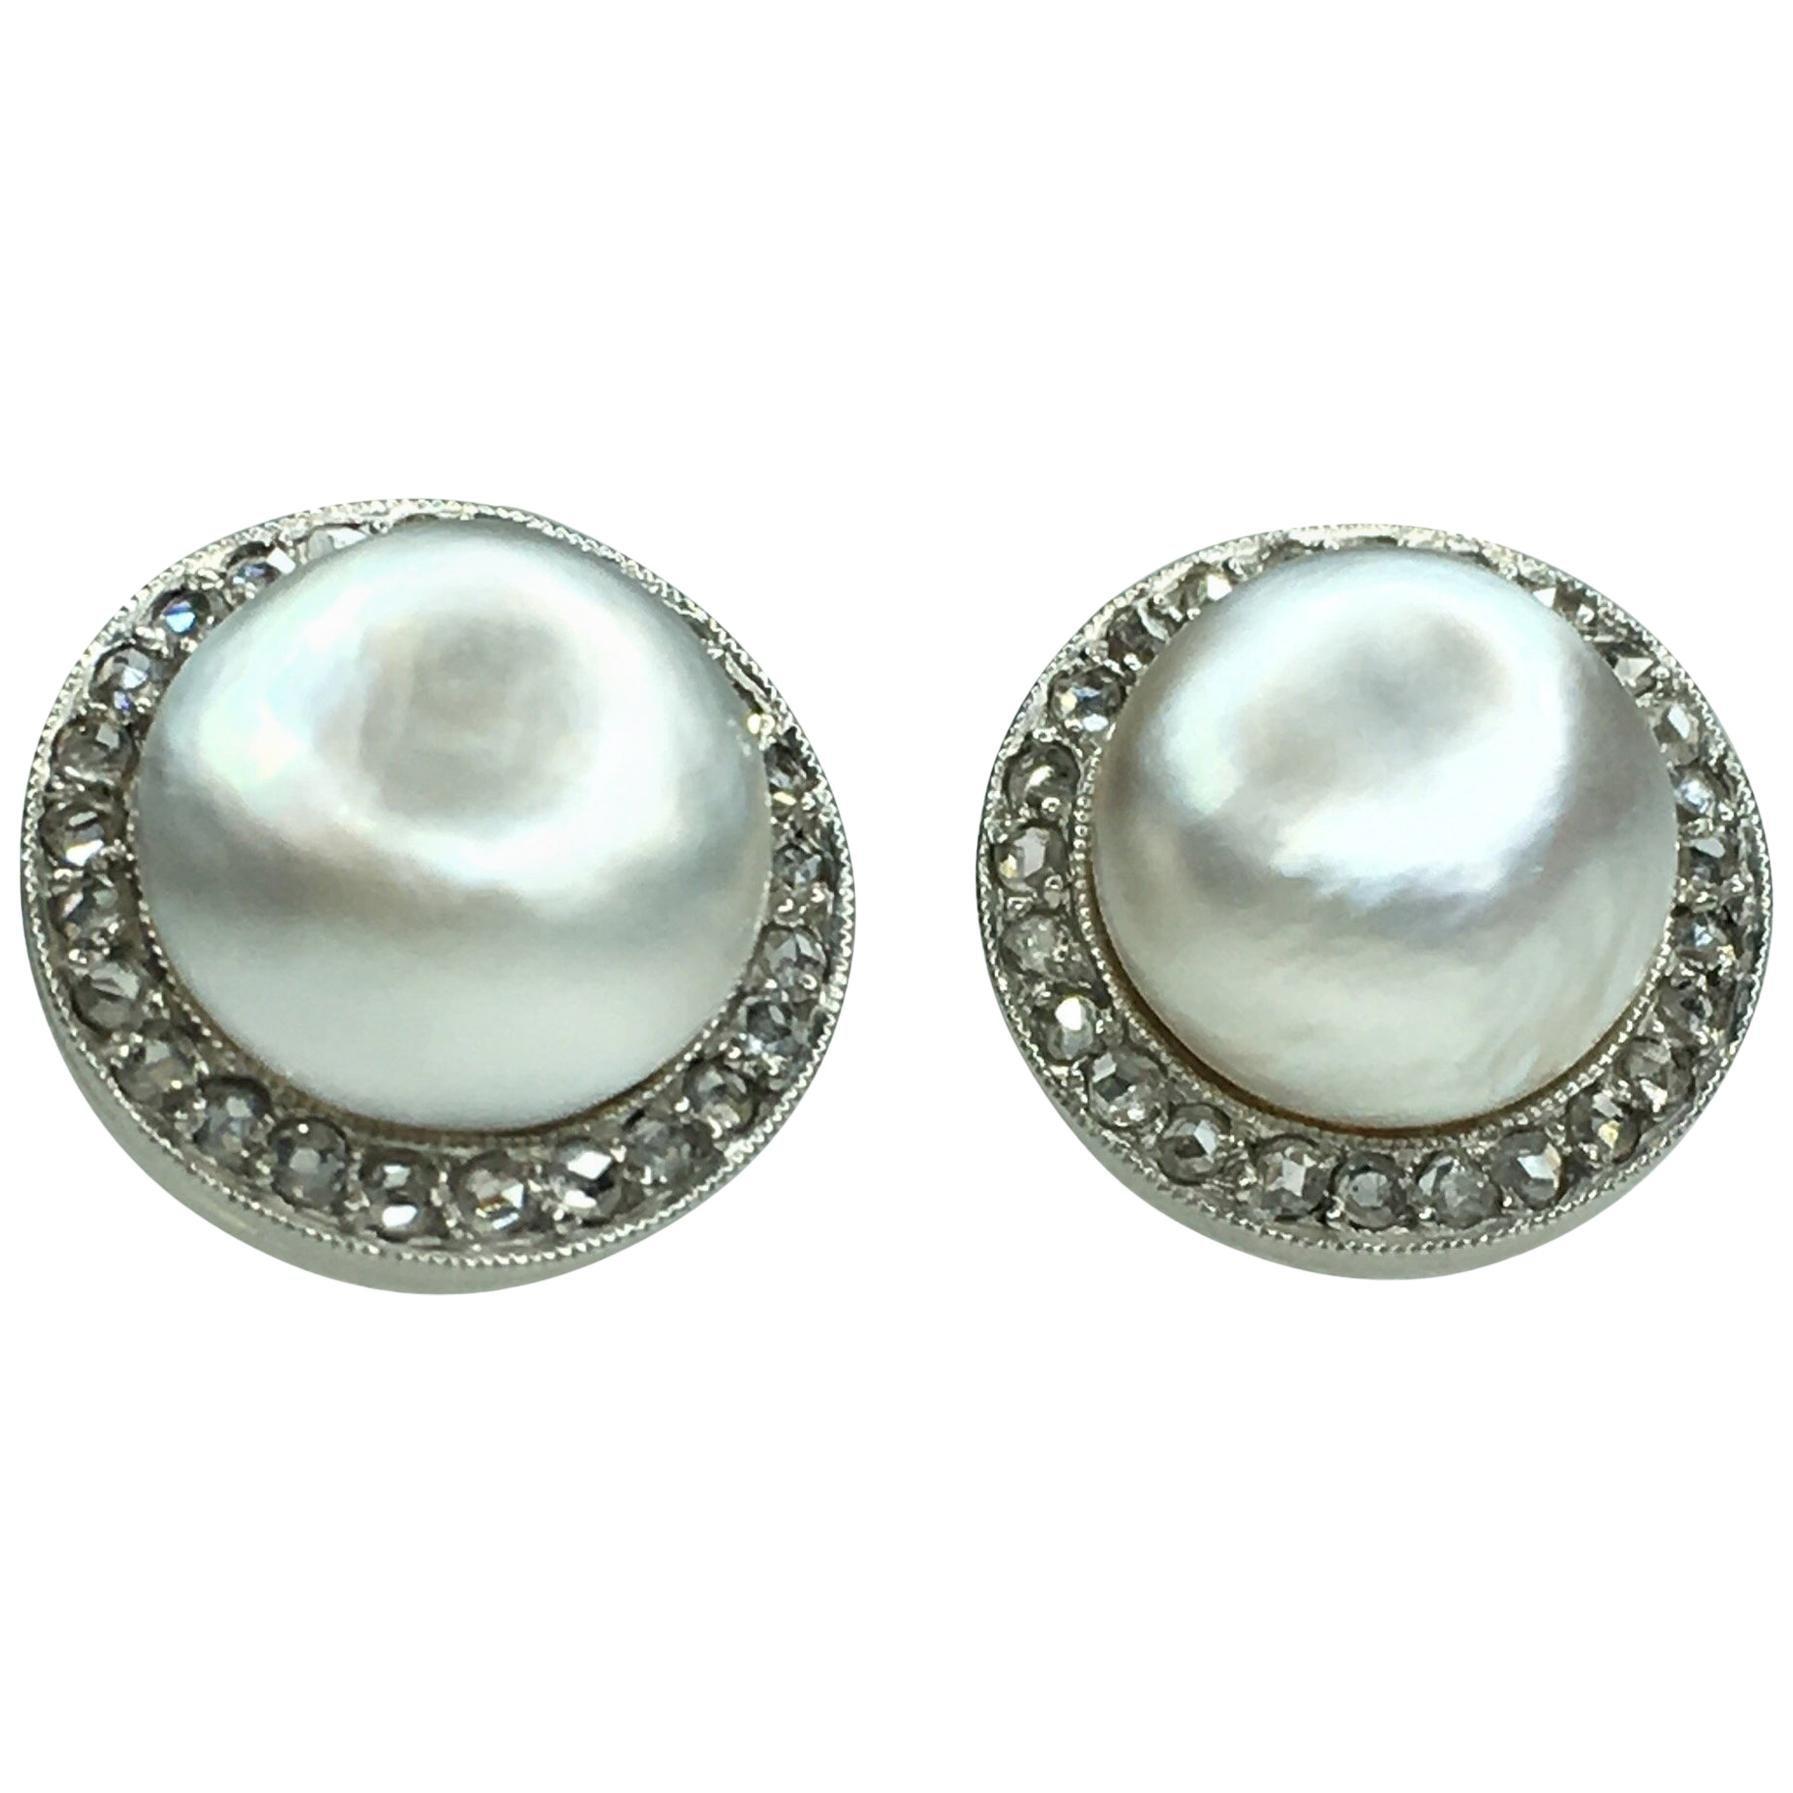 Gemolithos Natural Pearl and Diamond Stud Earrings, 1910